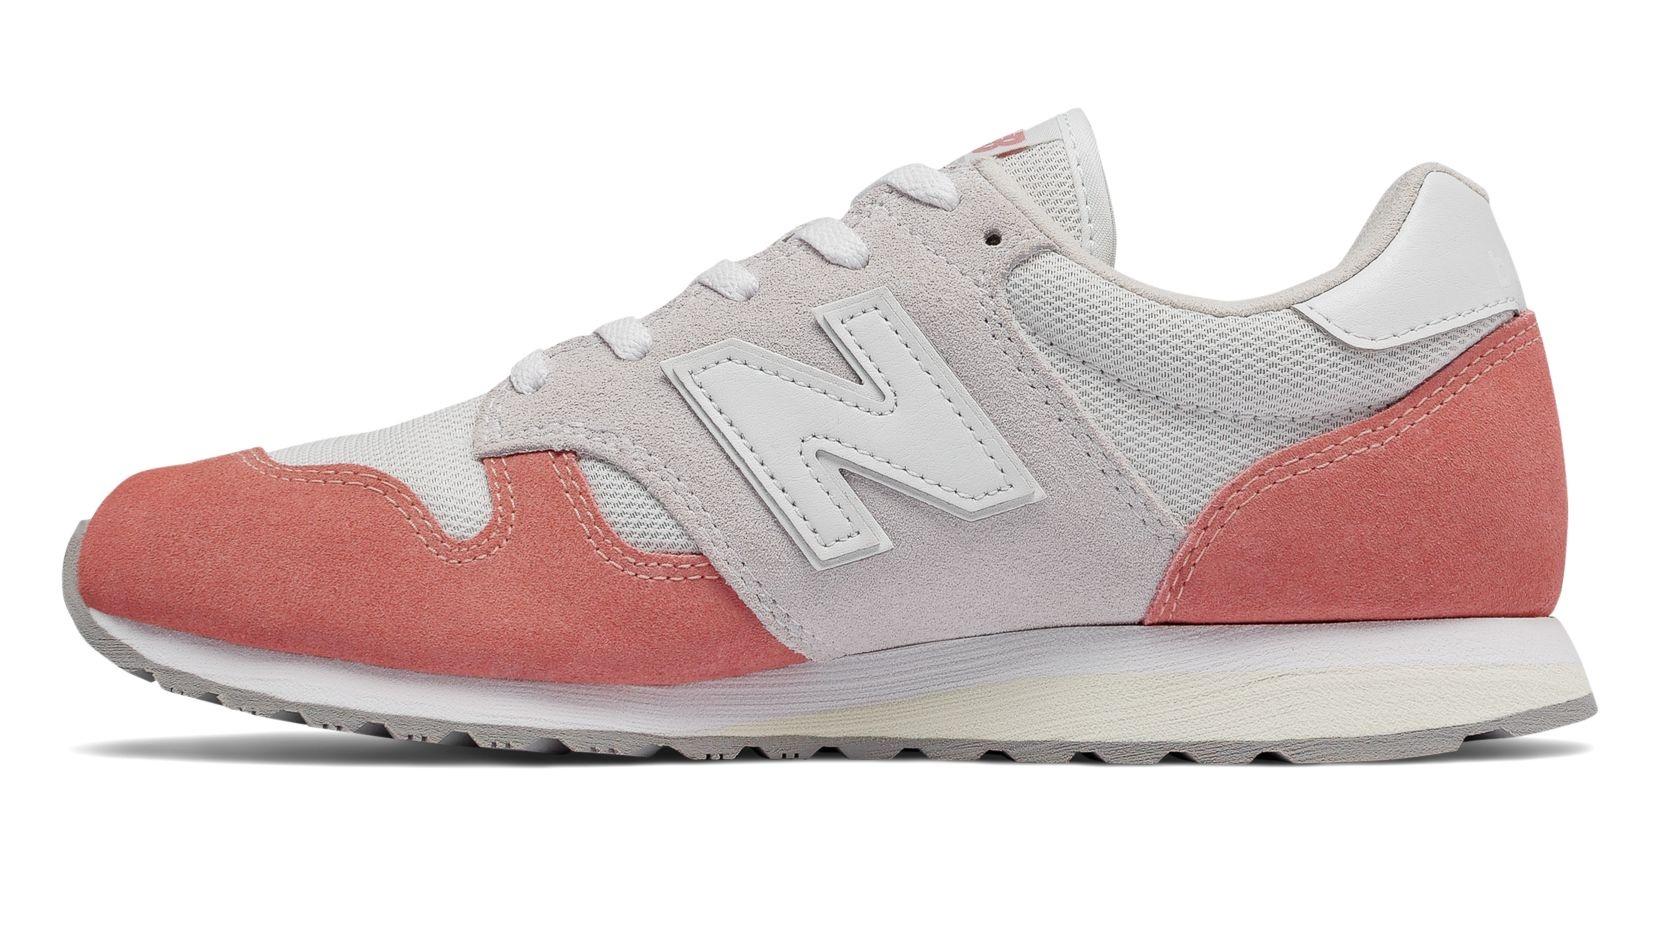 brand new b883b c127d New Balance sneakers WL 520 TD ladies pink   gray ...